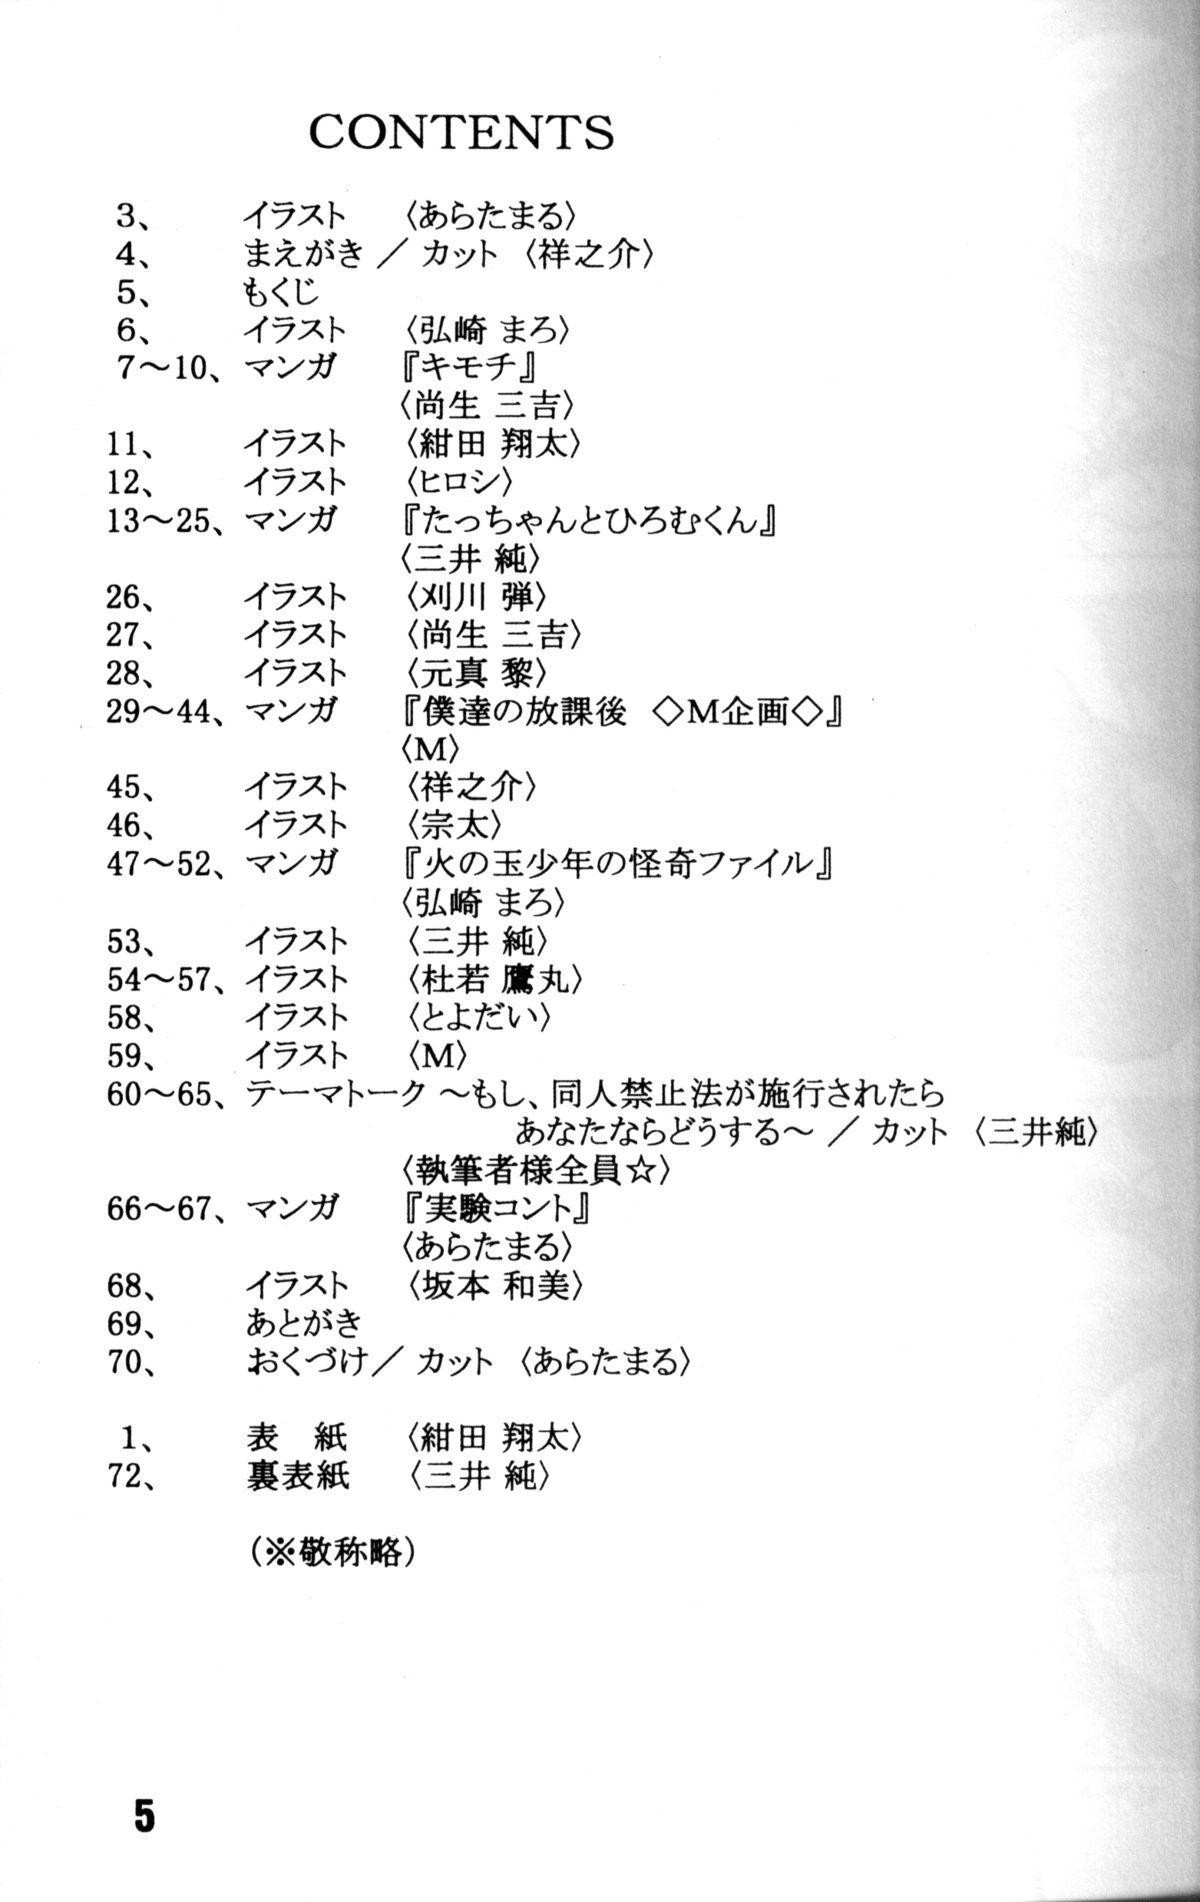 Anthology - Nekketsu Project - Volume 4 'Shounen Vanilla Essence' 3